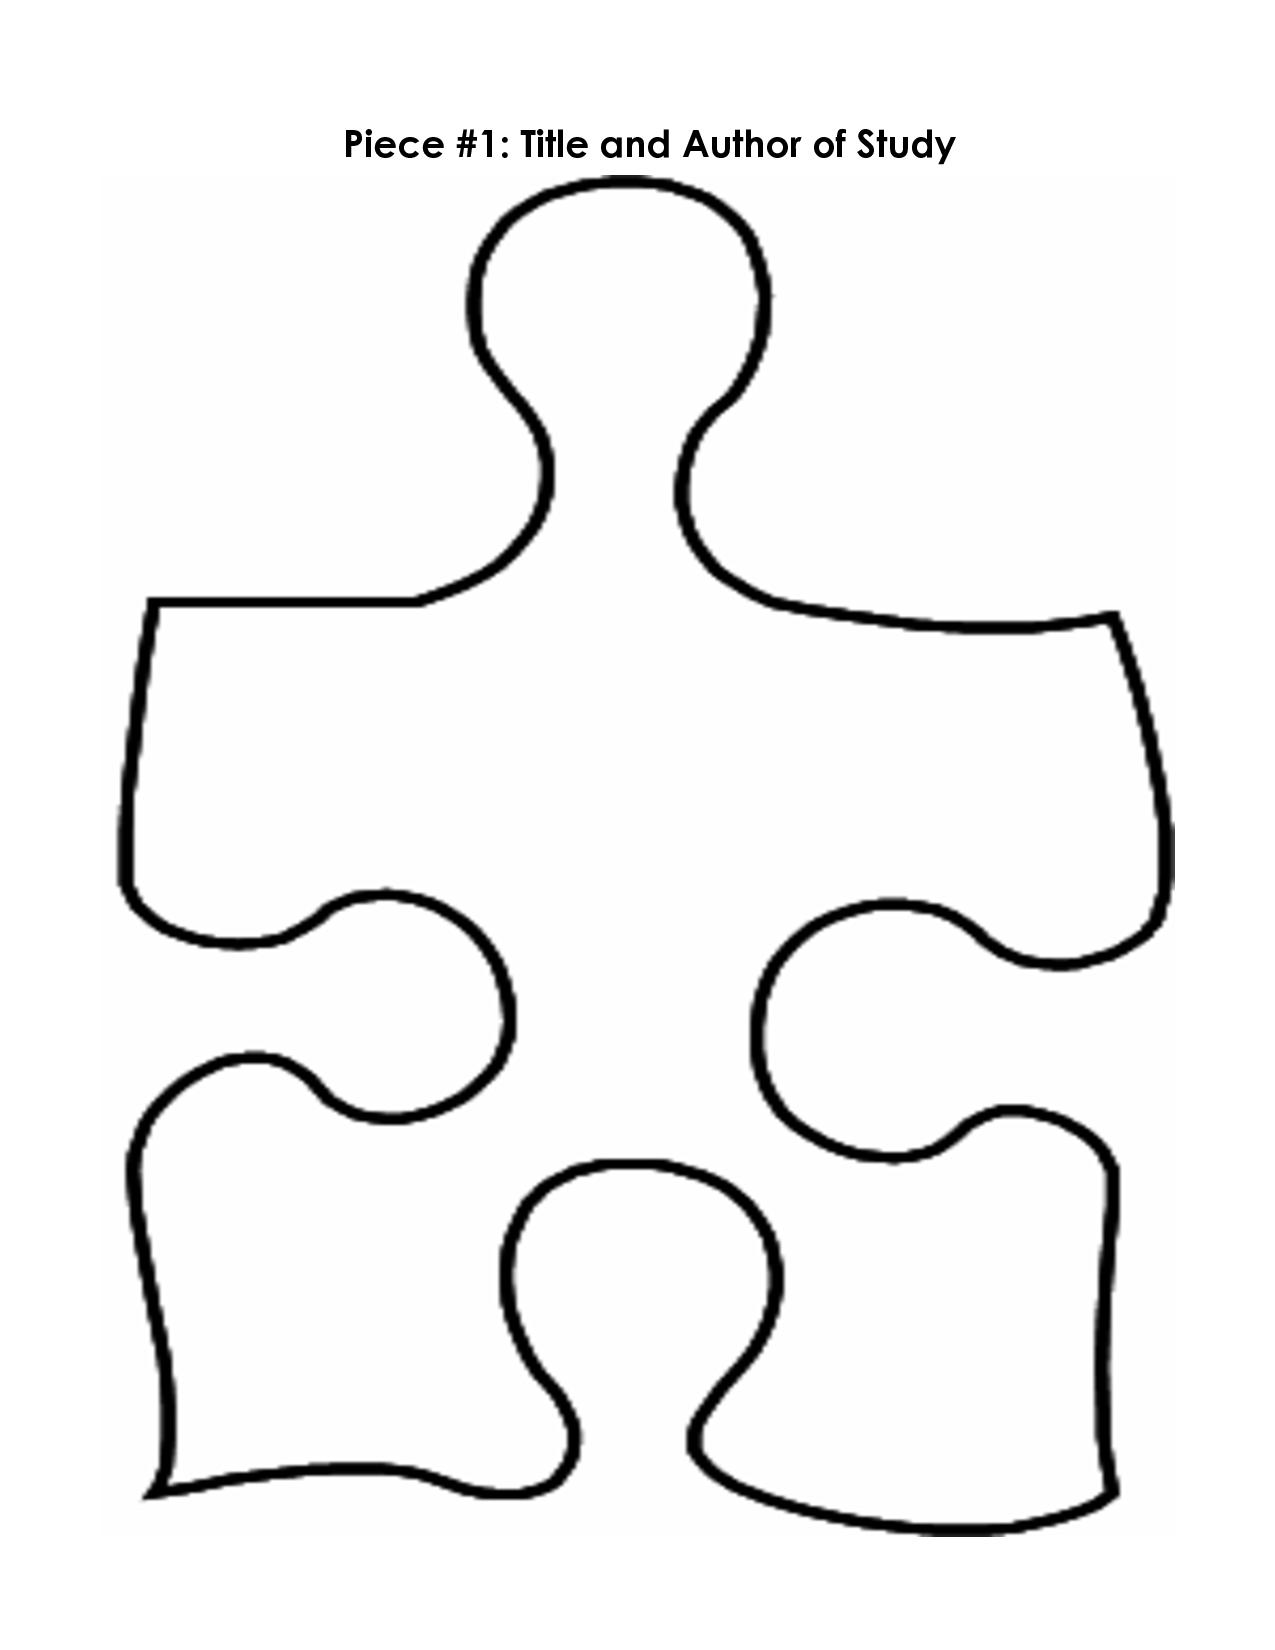 Puzzle Piece Coloring Sheet Clipart Best